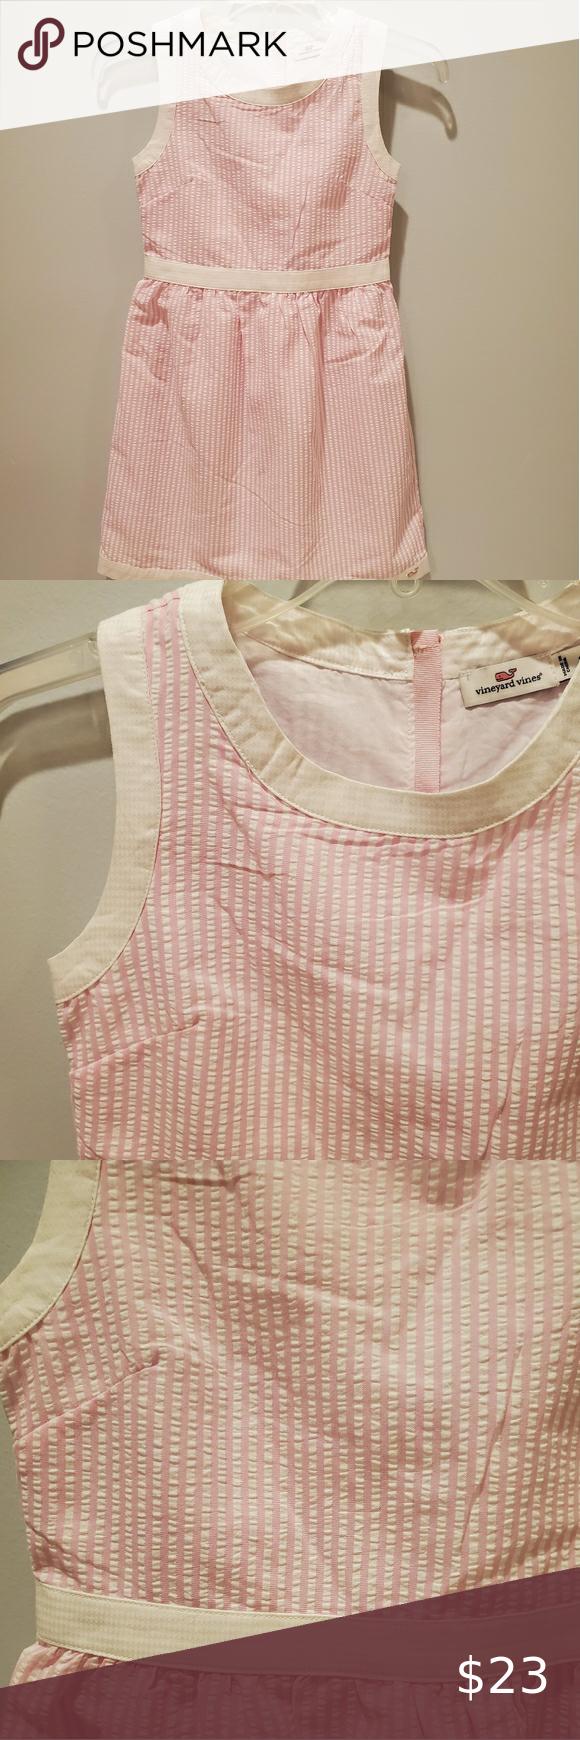 Vineyard Vines Seersucker Pink And White Dress Pink And White Dress Seersucker Dress Seersucker [ 1740 x 580 Pixel ]